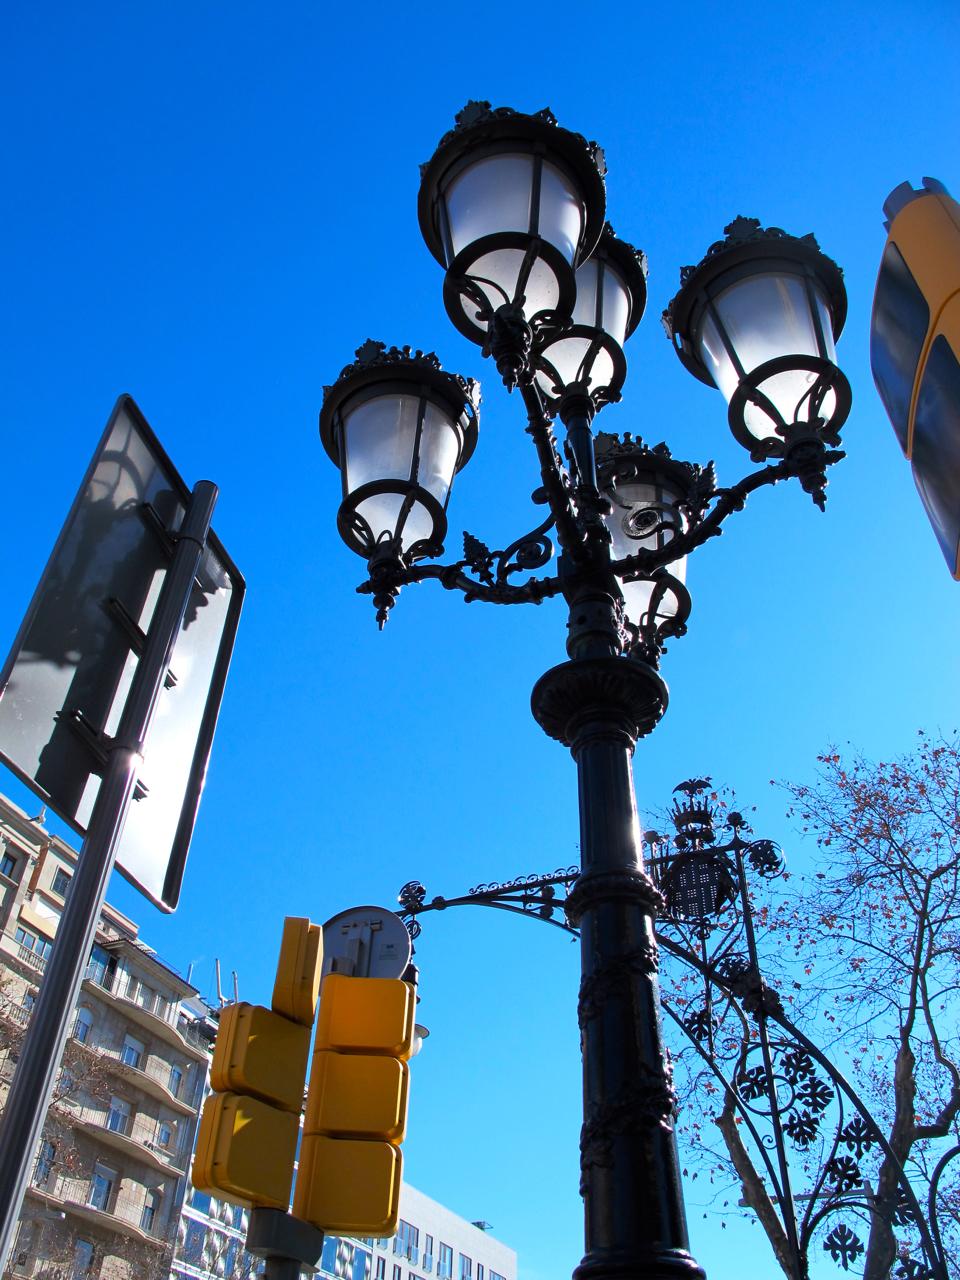 Barcelona Sightseeing Gaudi